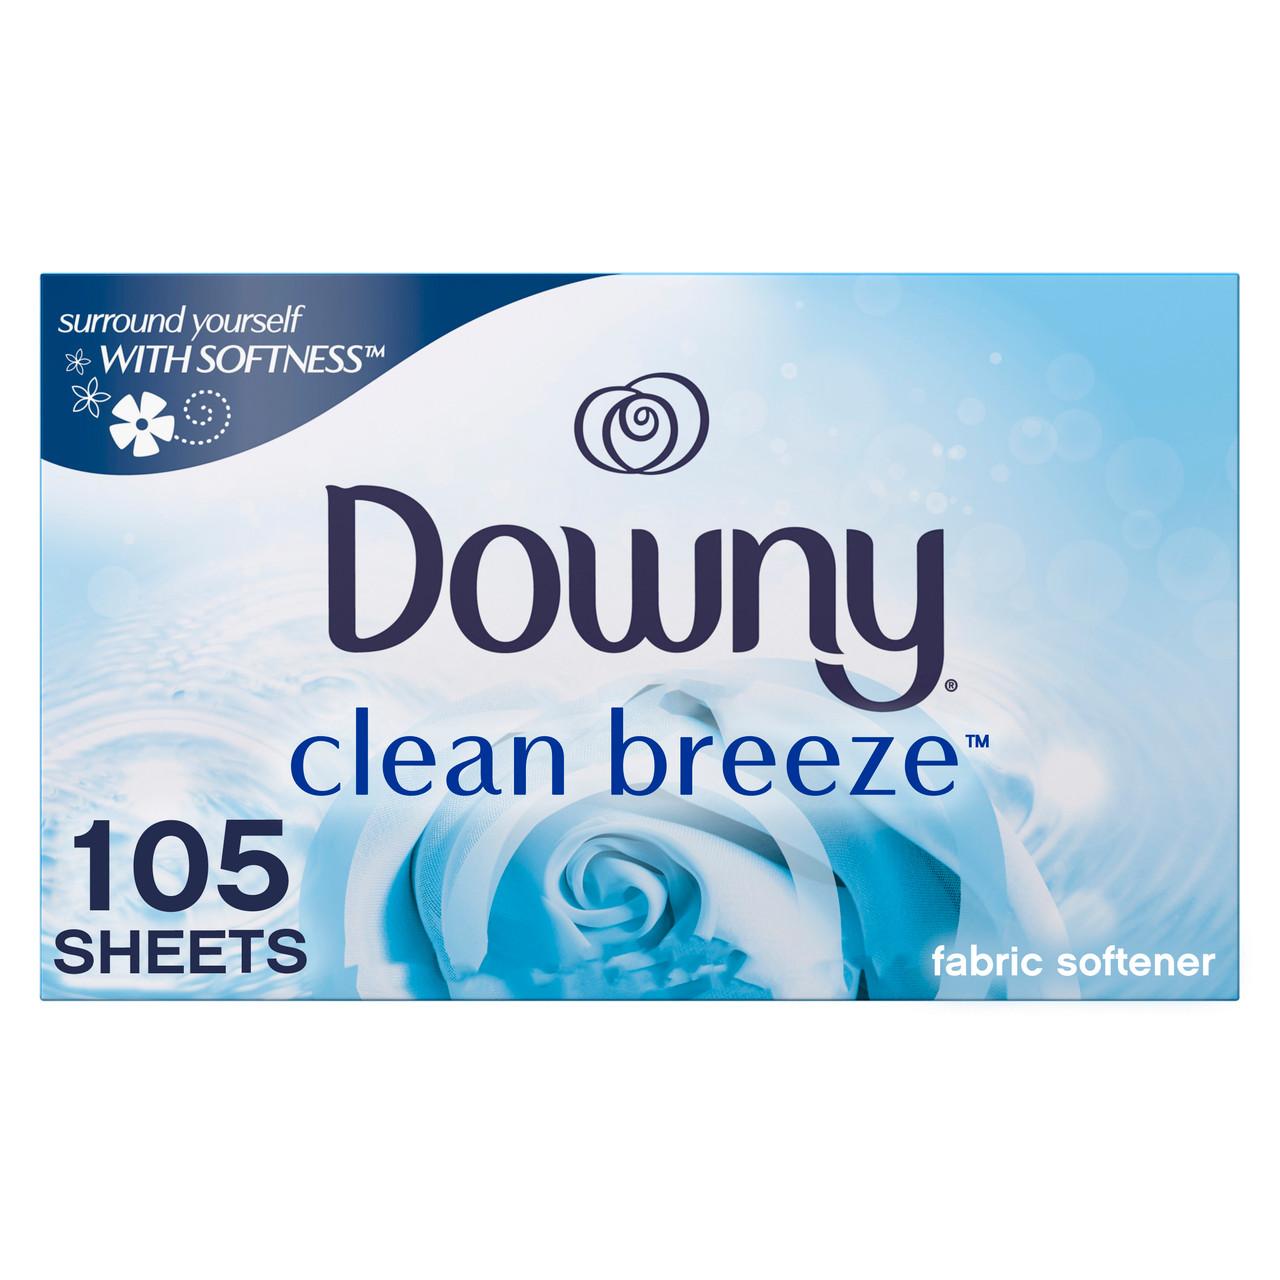 Fabric Softener Vs Dryer Sheets